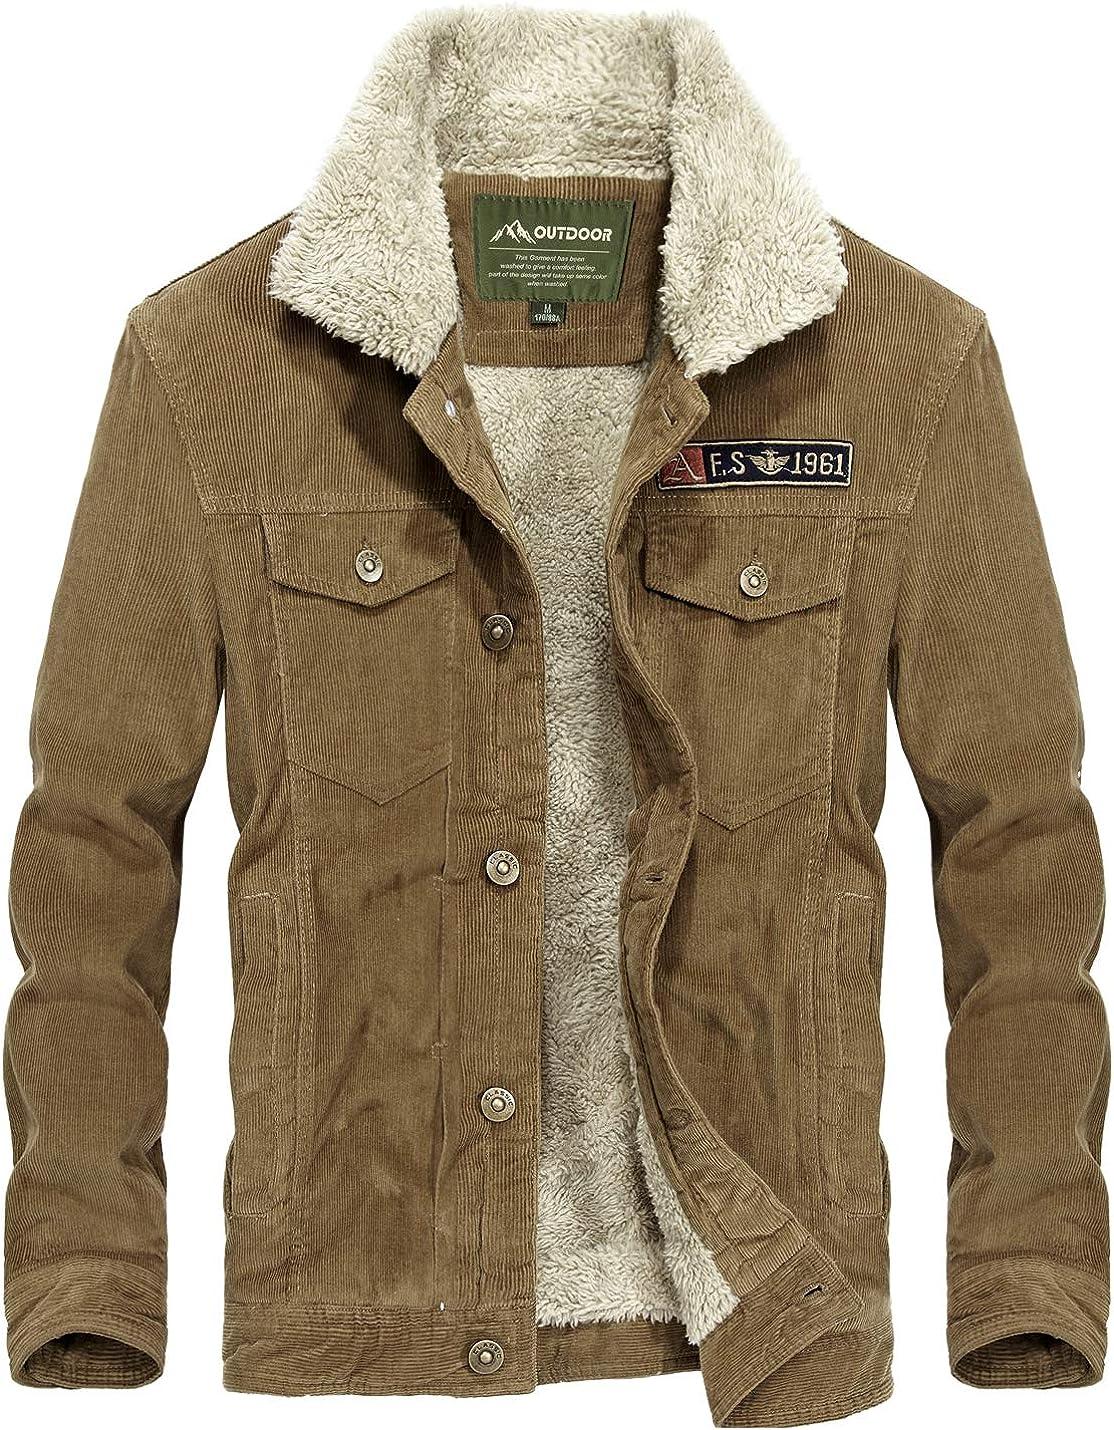 Flygo Mens Vintage Button Down Slim Fit Fleece Lined Corduroy Jacket Outerwear